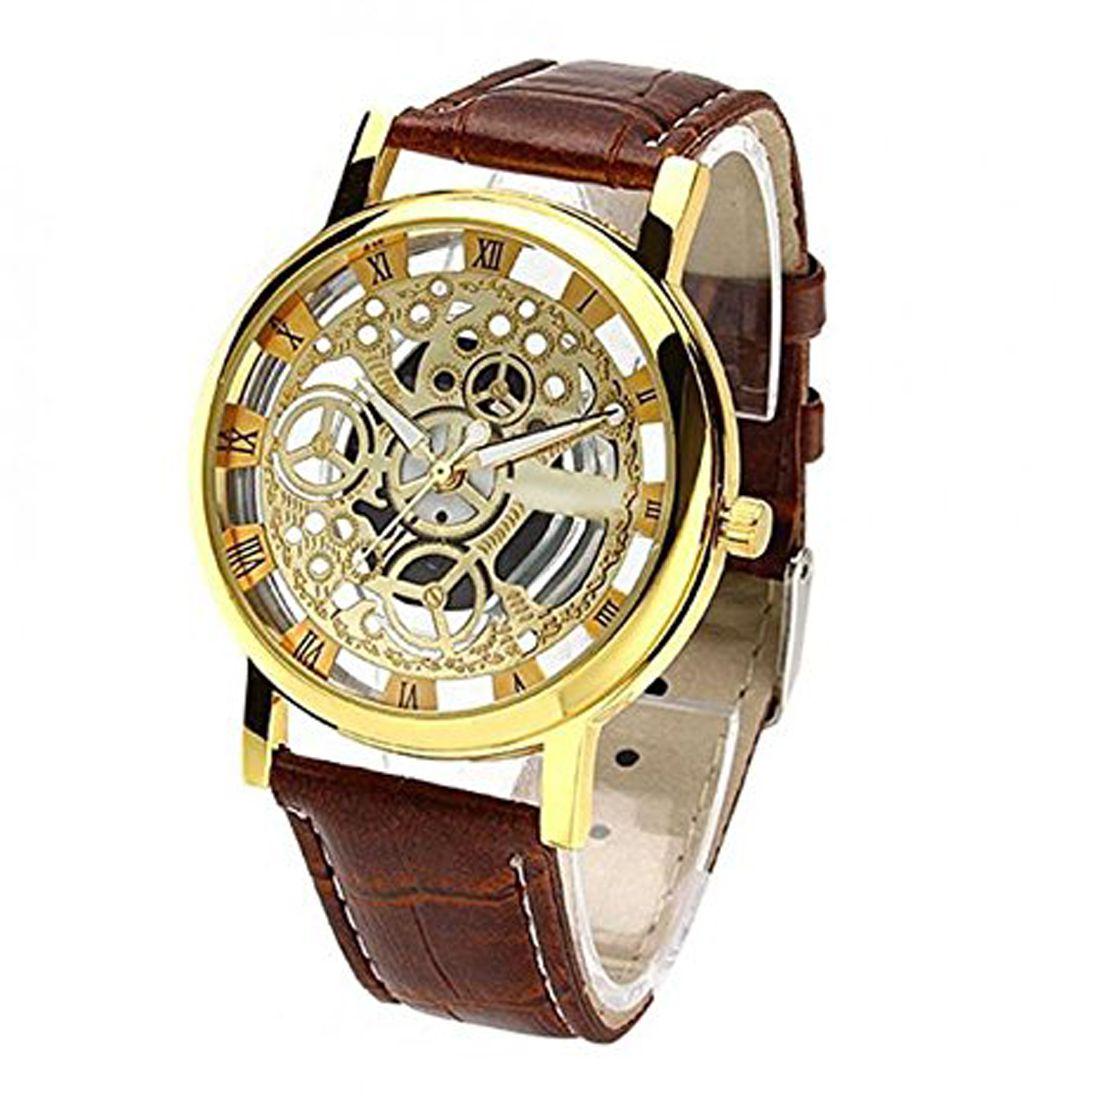 Satva The Brand Brown Leather Strap Gold Dial Transperant Designer Watch For Men Boys